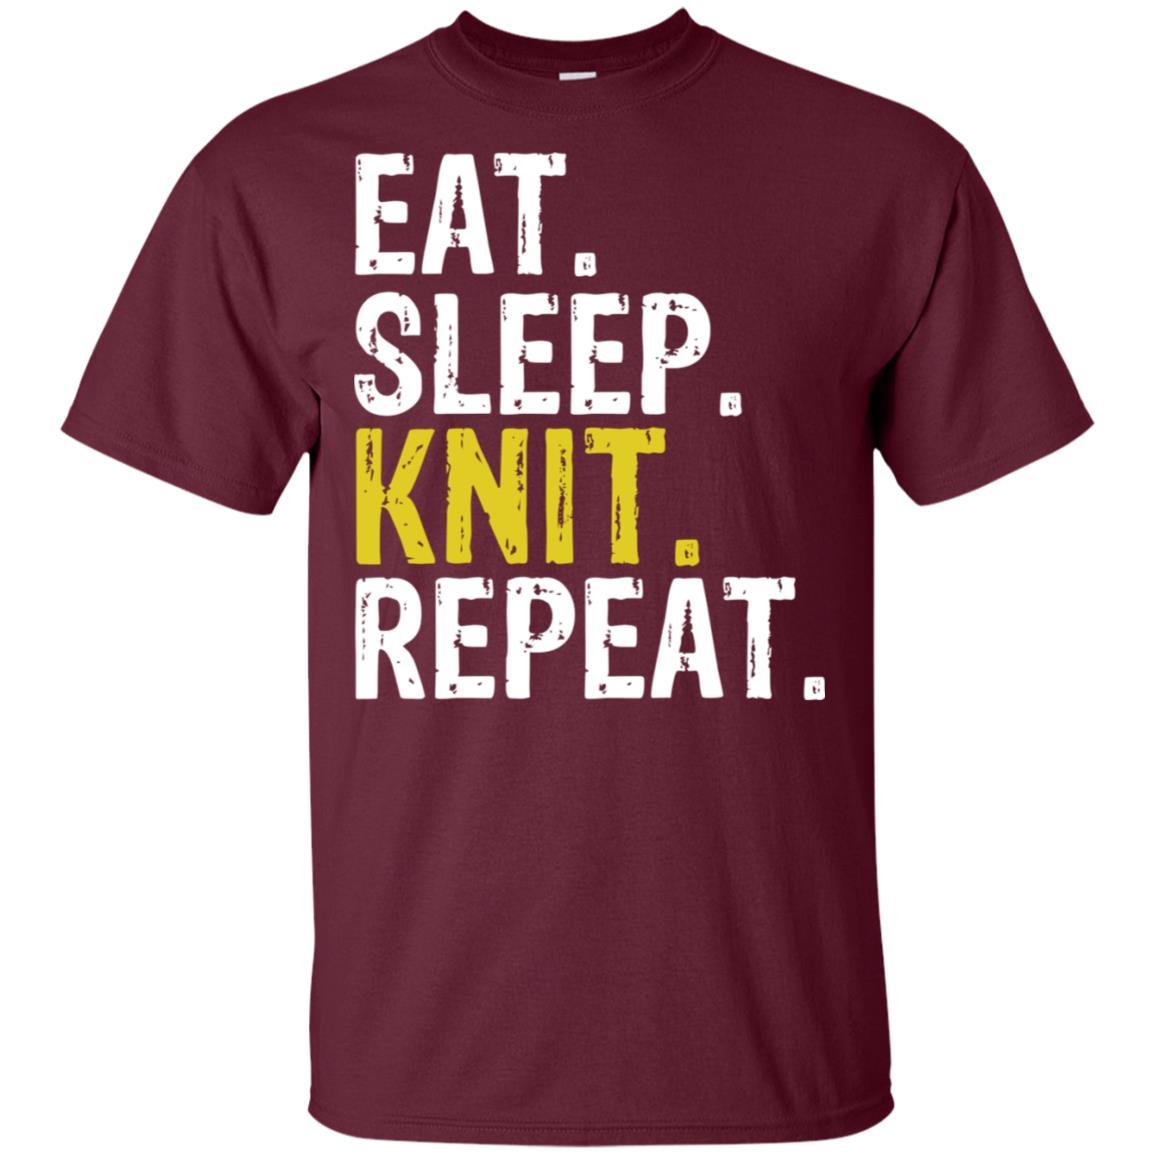 Eat Sleep Knit Repeat Knitting Needles Unisex Short Sleeve